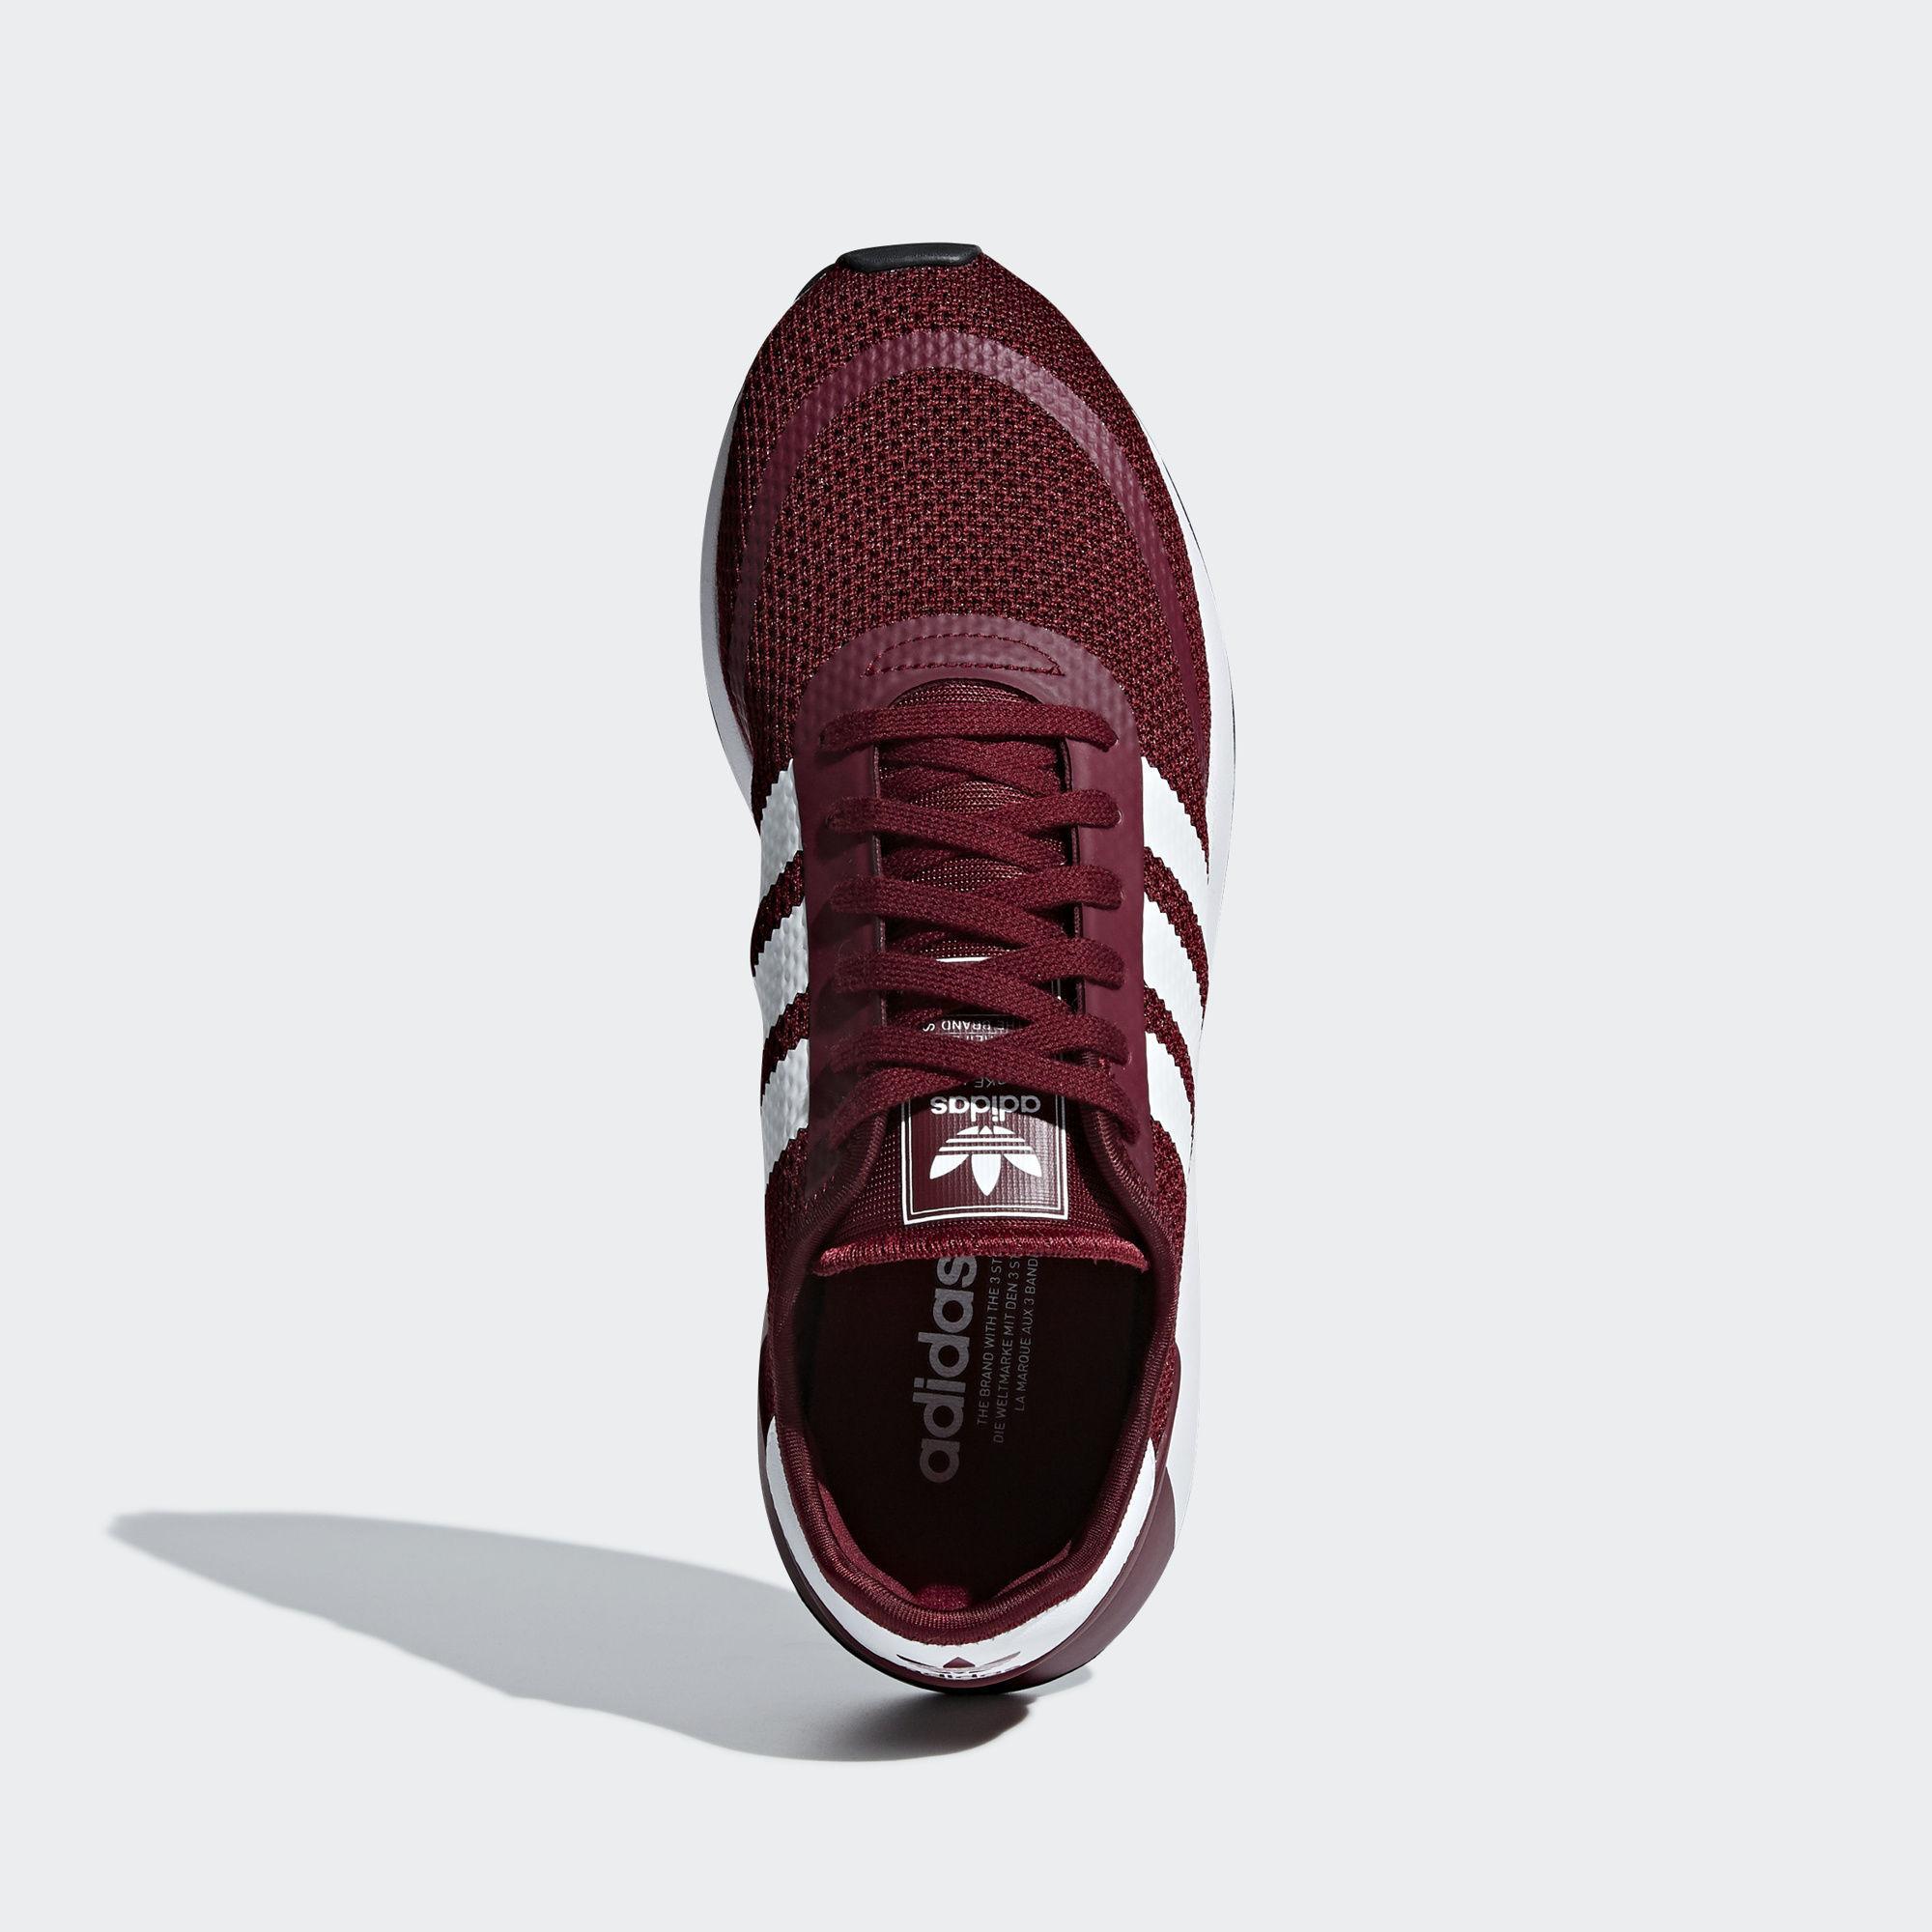 huge discount ecabe 569c1 Adidas Originals - Red Adidas N-5923 Collegiate Burgundy  Ftw White  Core  Black. View fullscreen